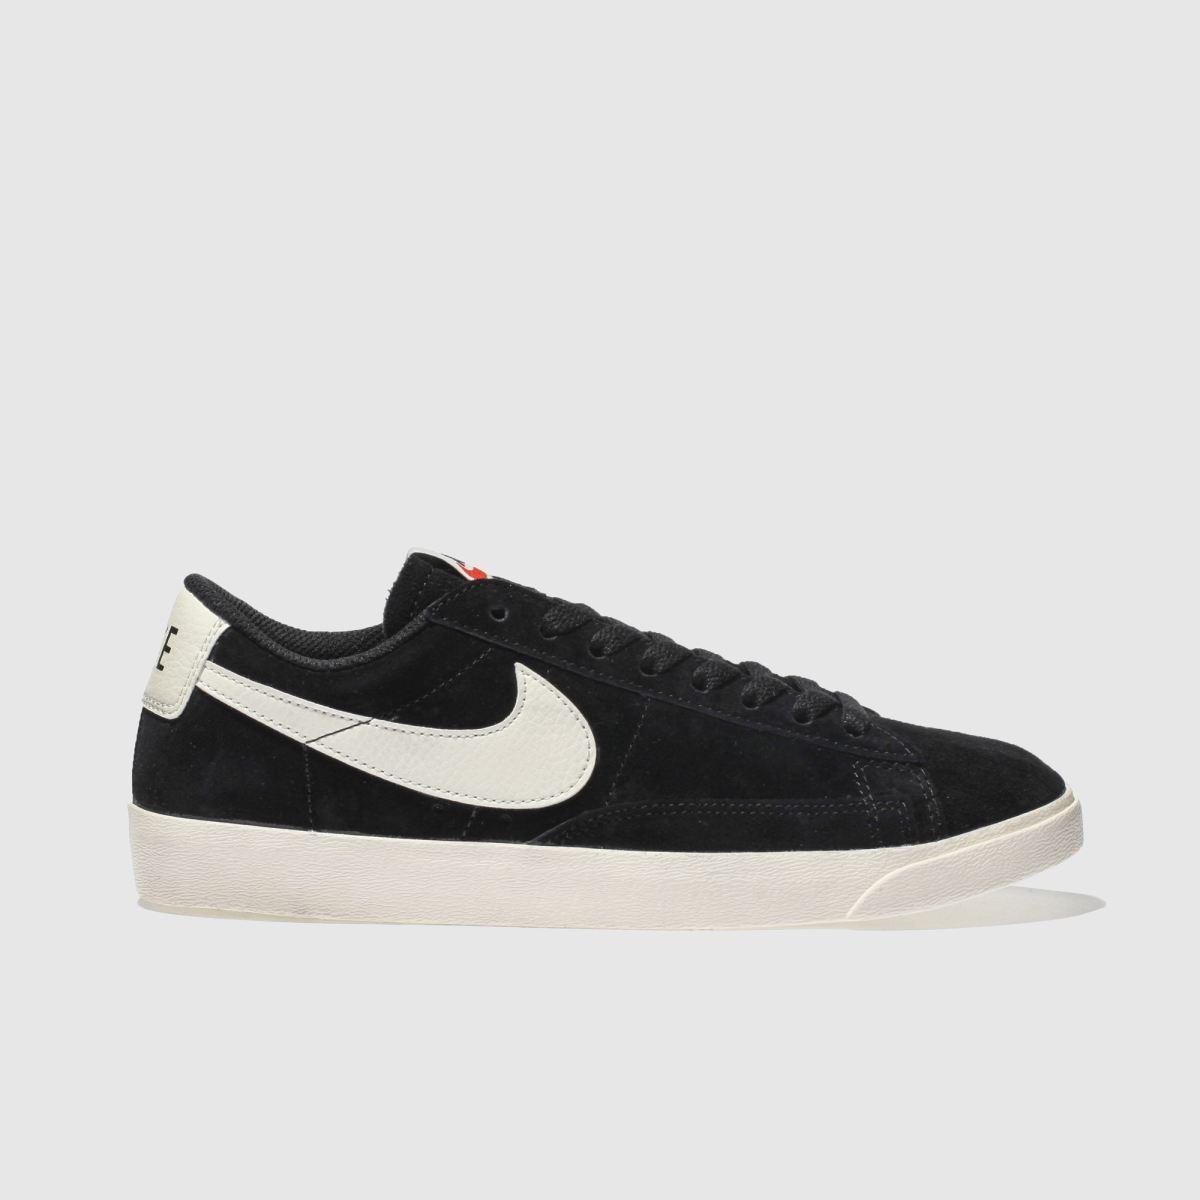 Nike Black & White Blazer Low Suede Trainers